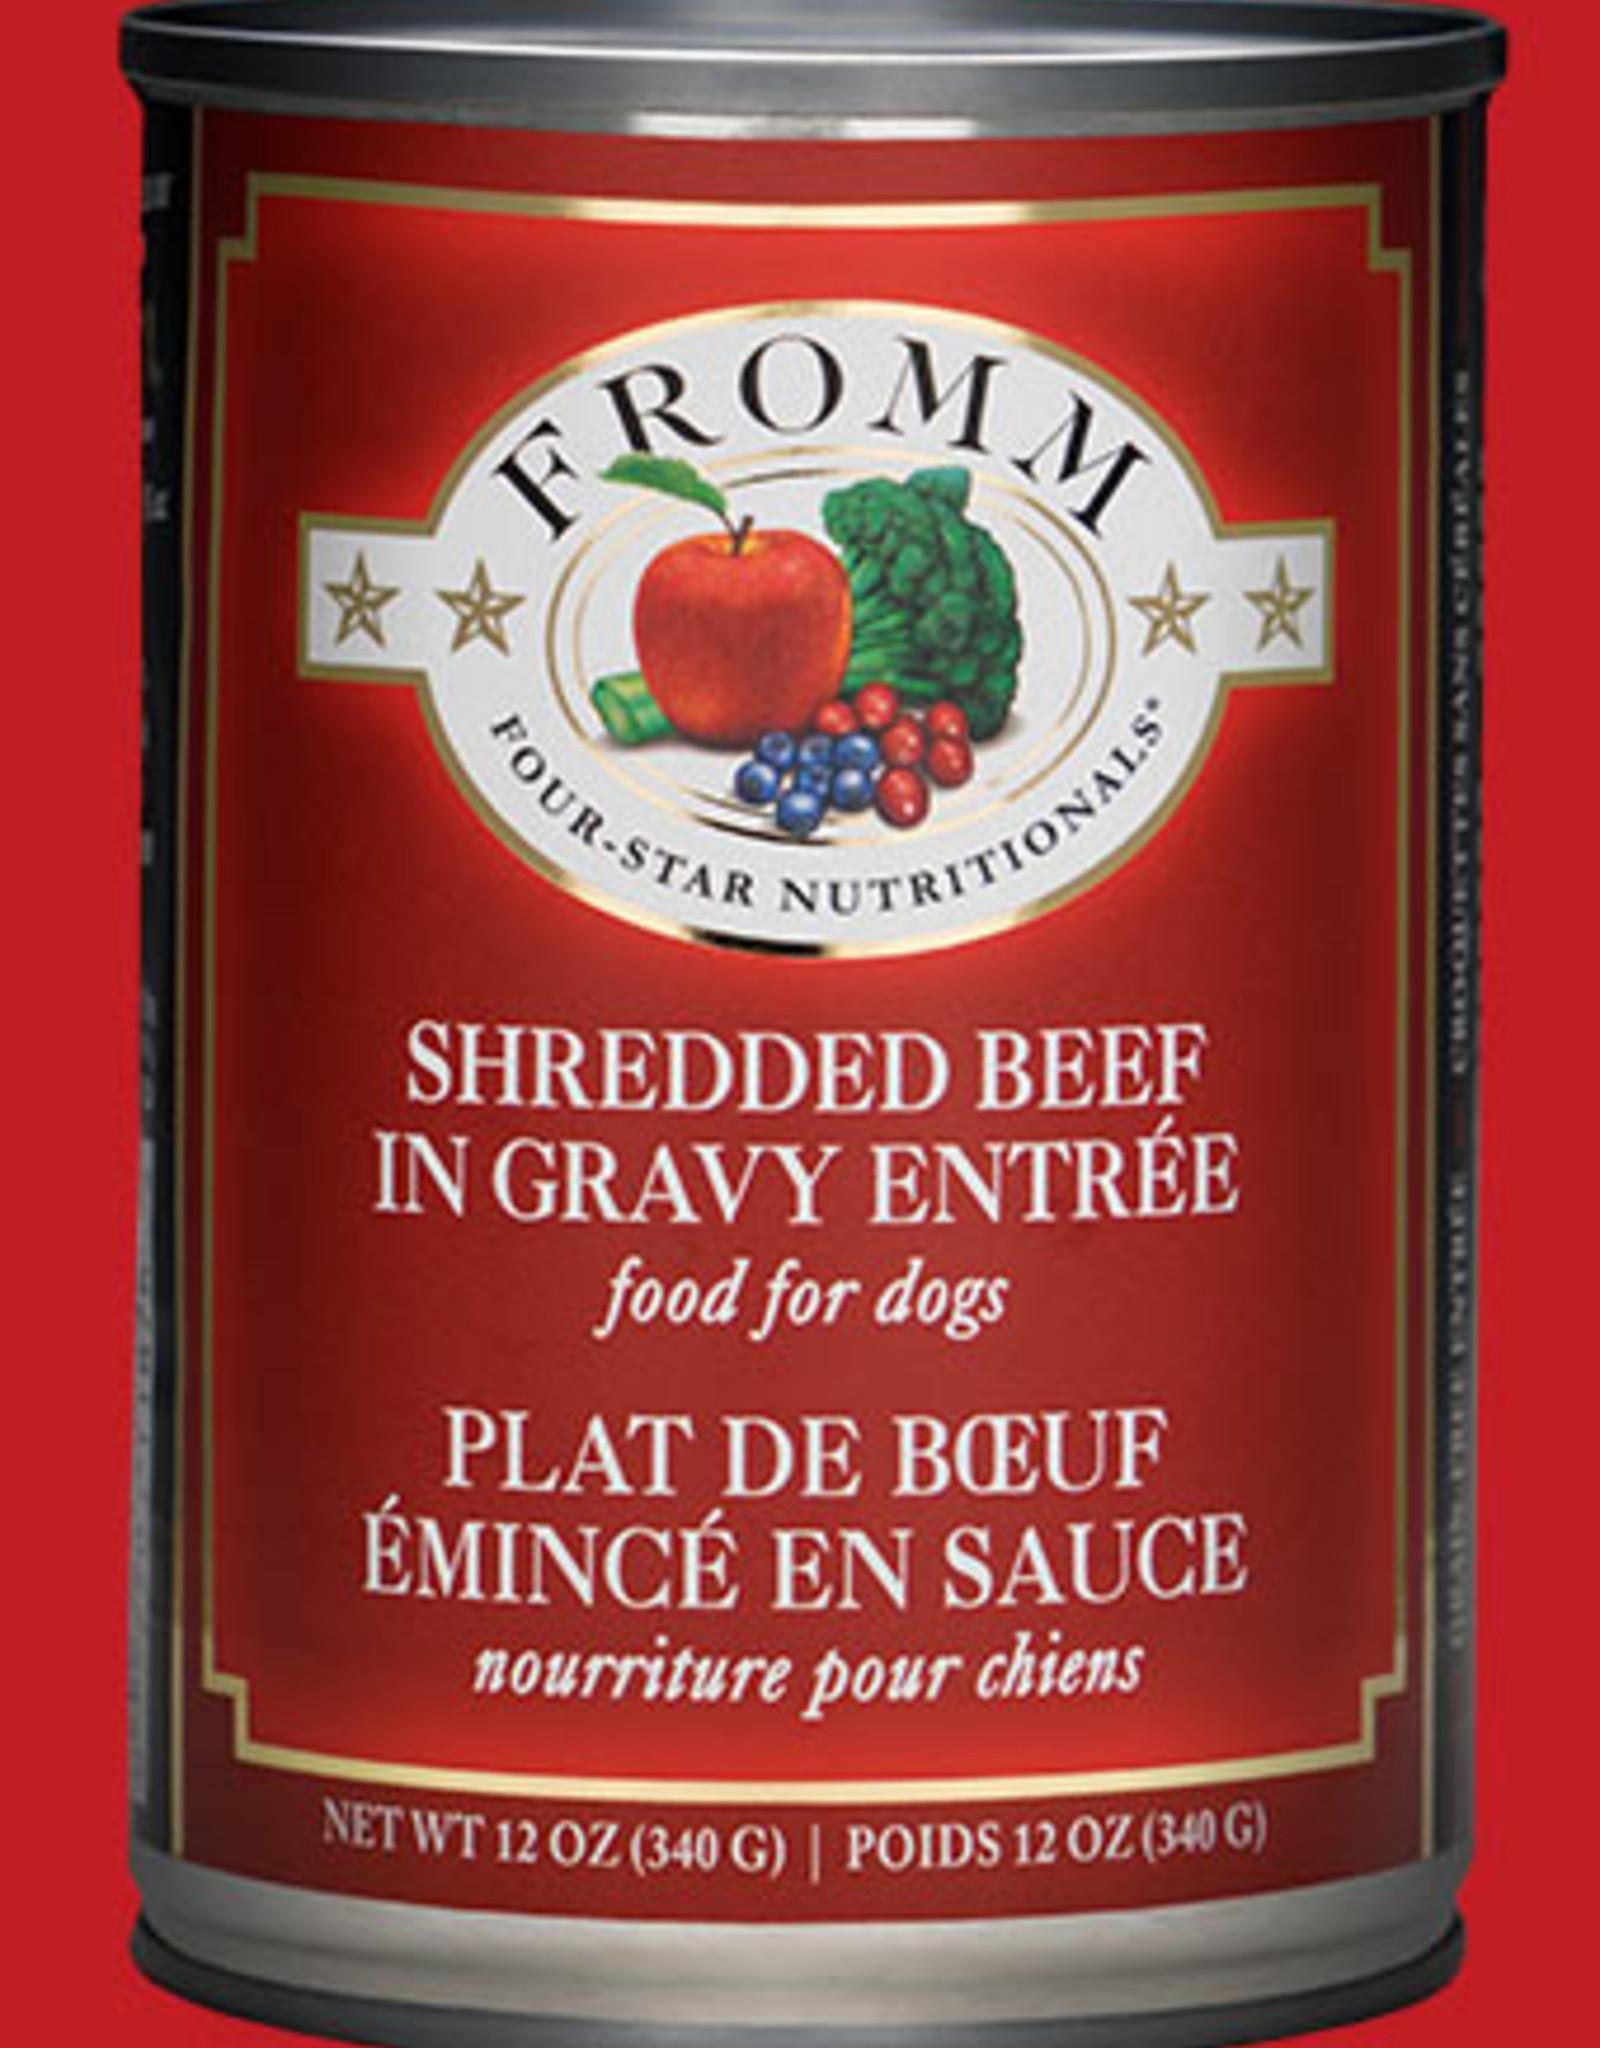 Fromm Shredded Beef in Gravy Entree 12oz